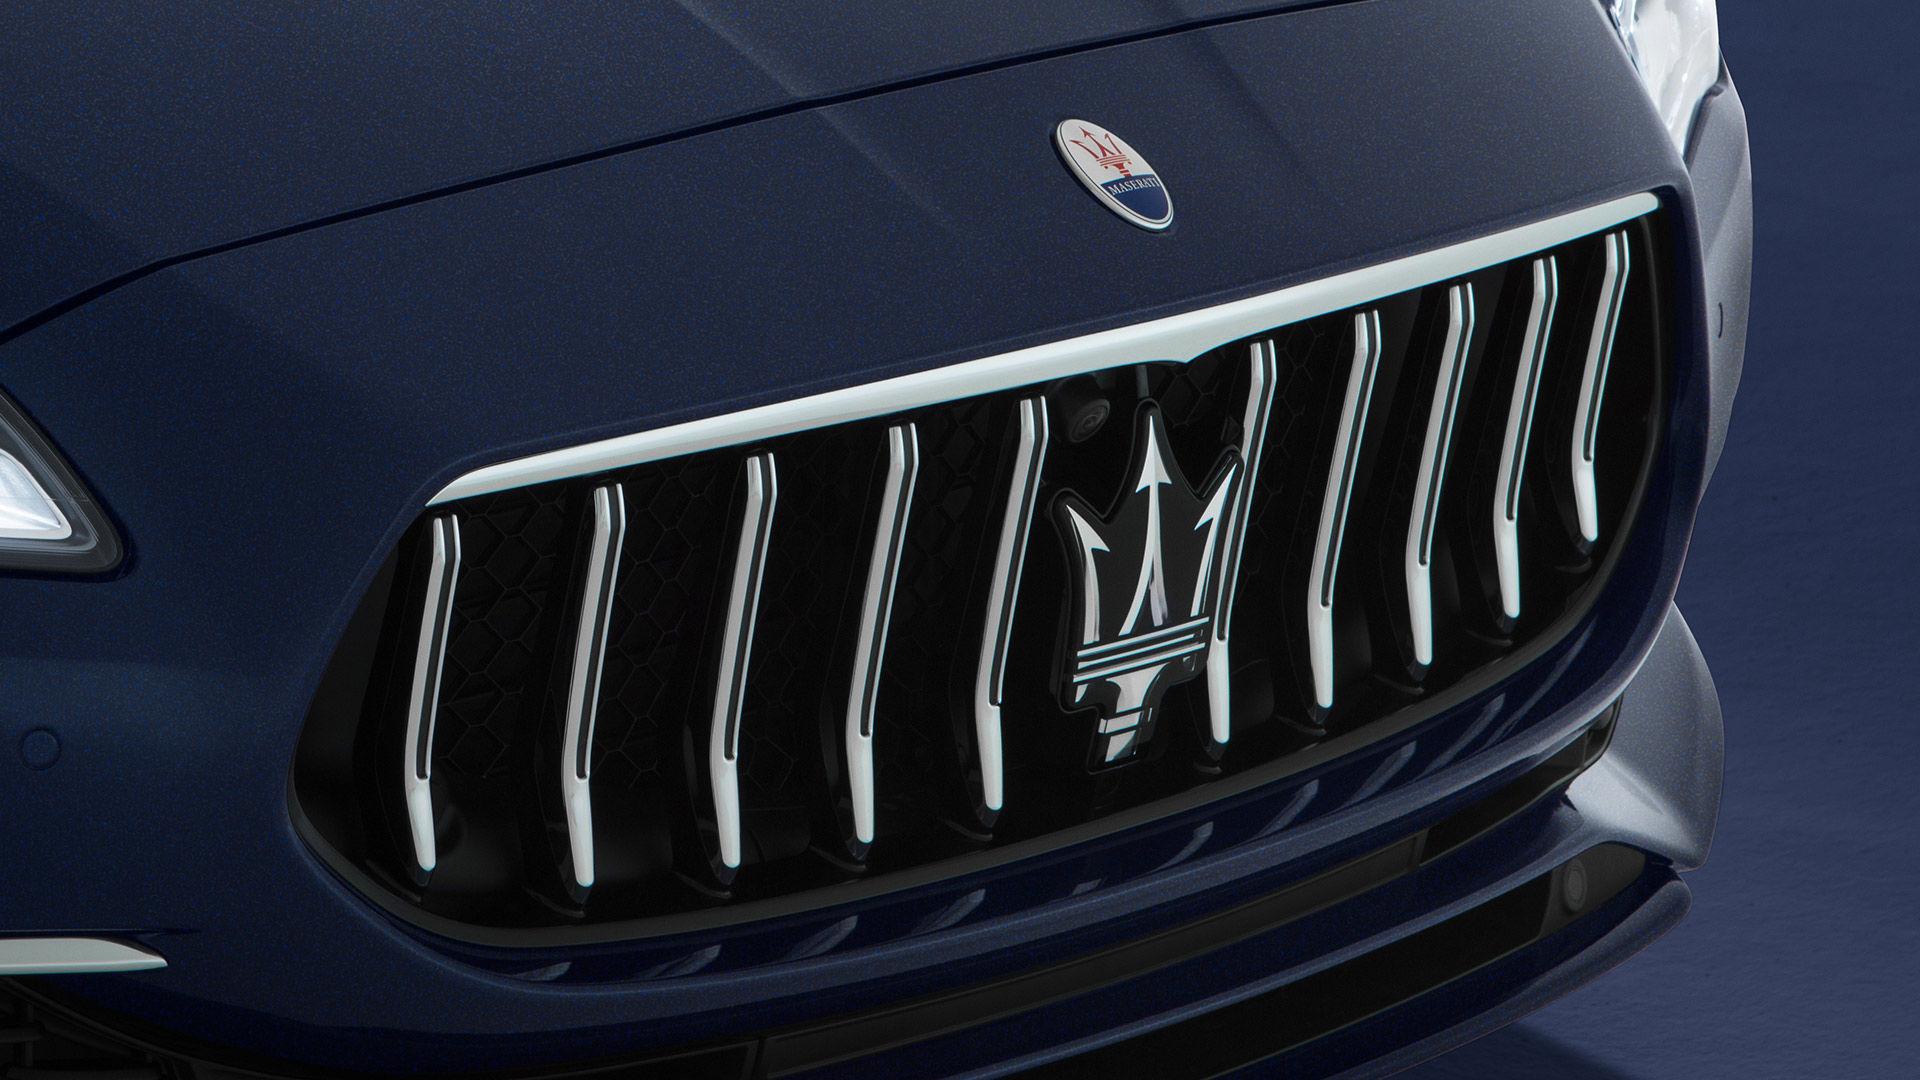 Maserati Quattroporte: Kühlergrill der Sportlimousine